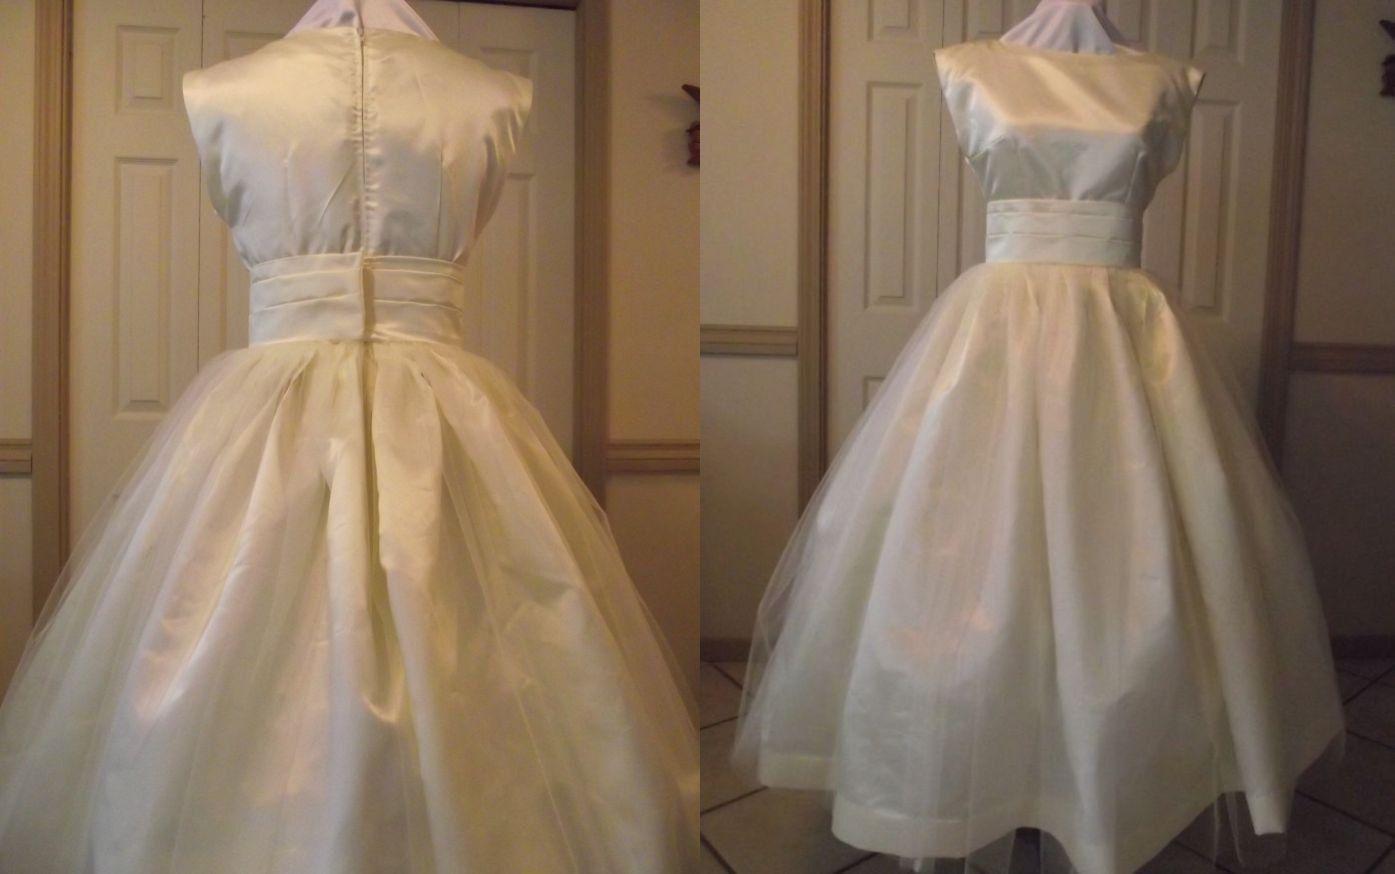 Plus size retro wedding dresses  Audrey yes  wedding ideas  Pinterest  Tea length Gowns and